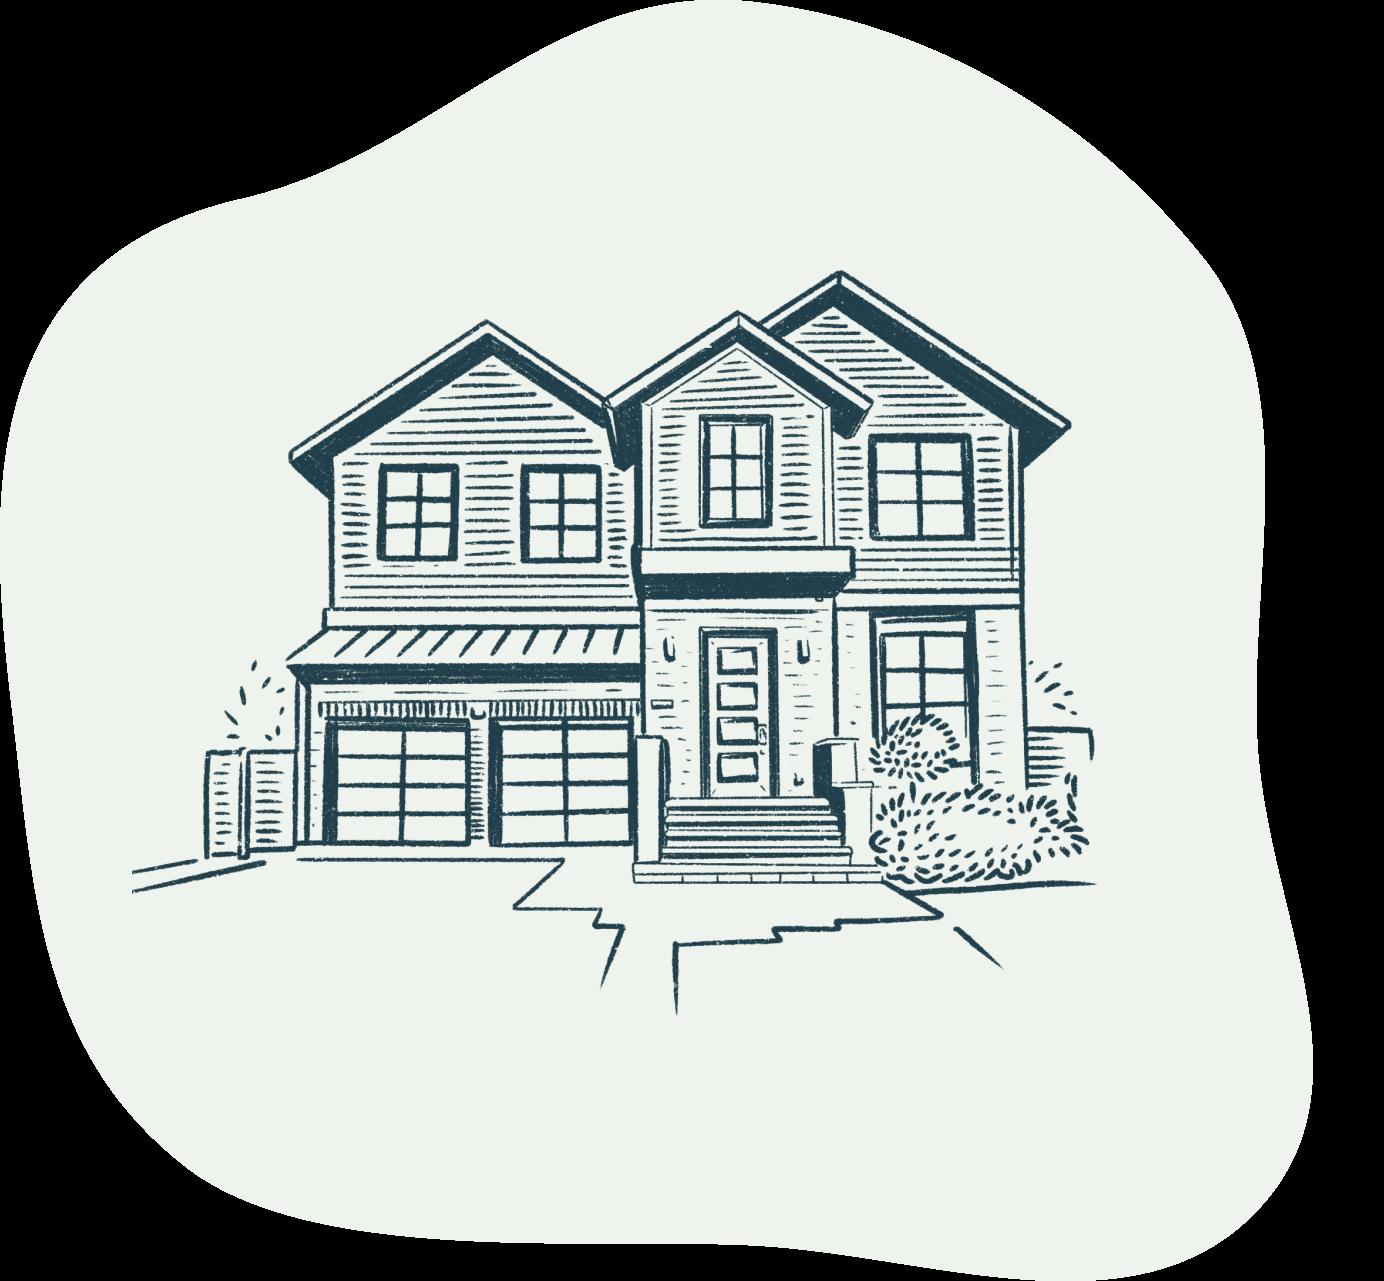 GetGround illustration of a house